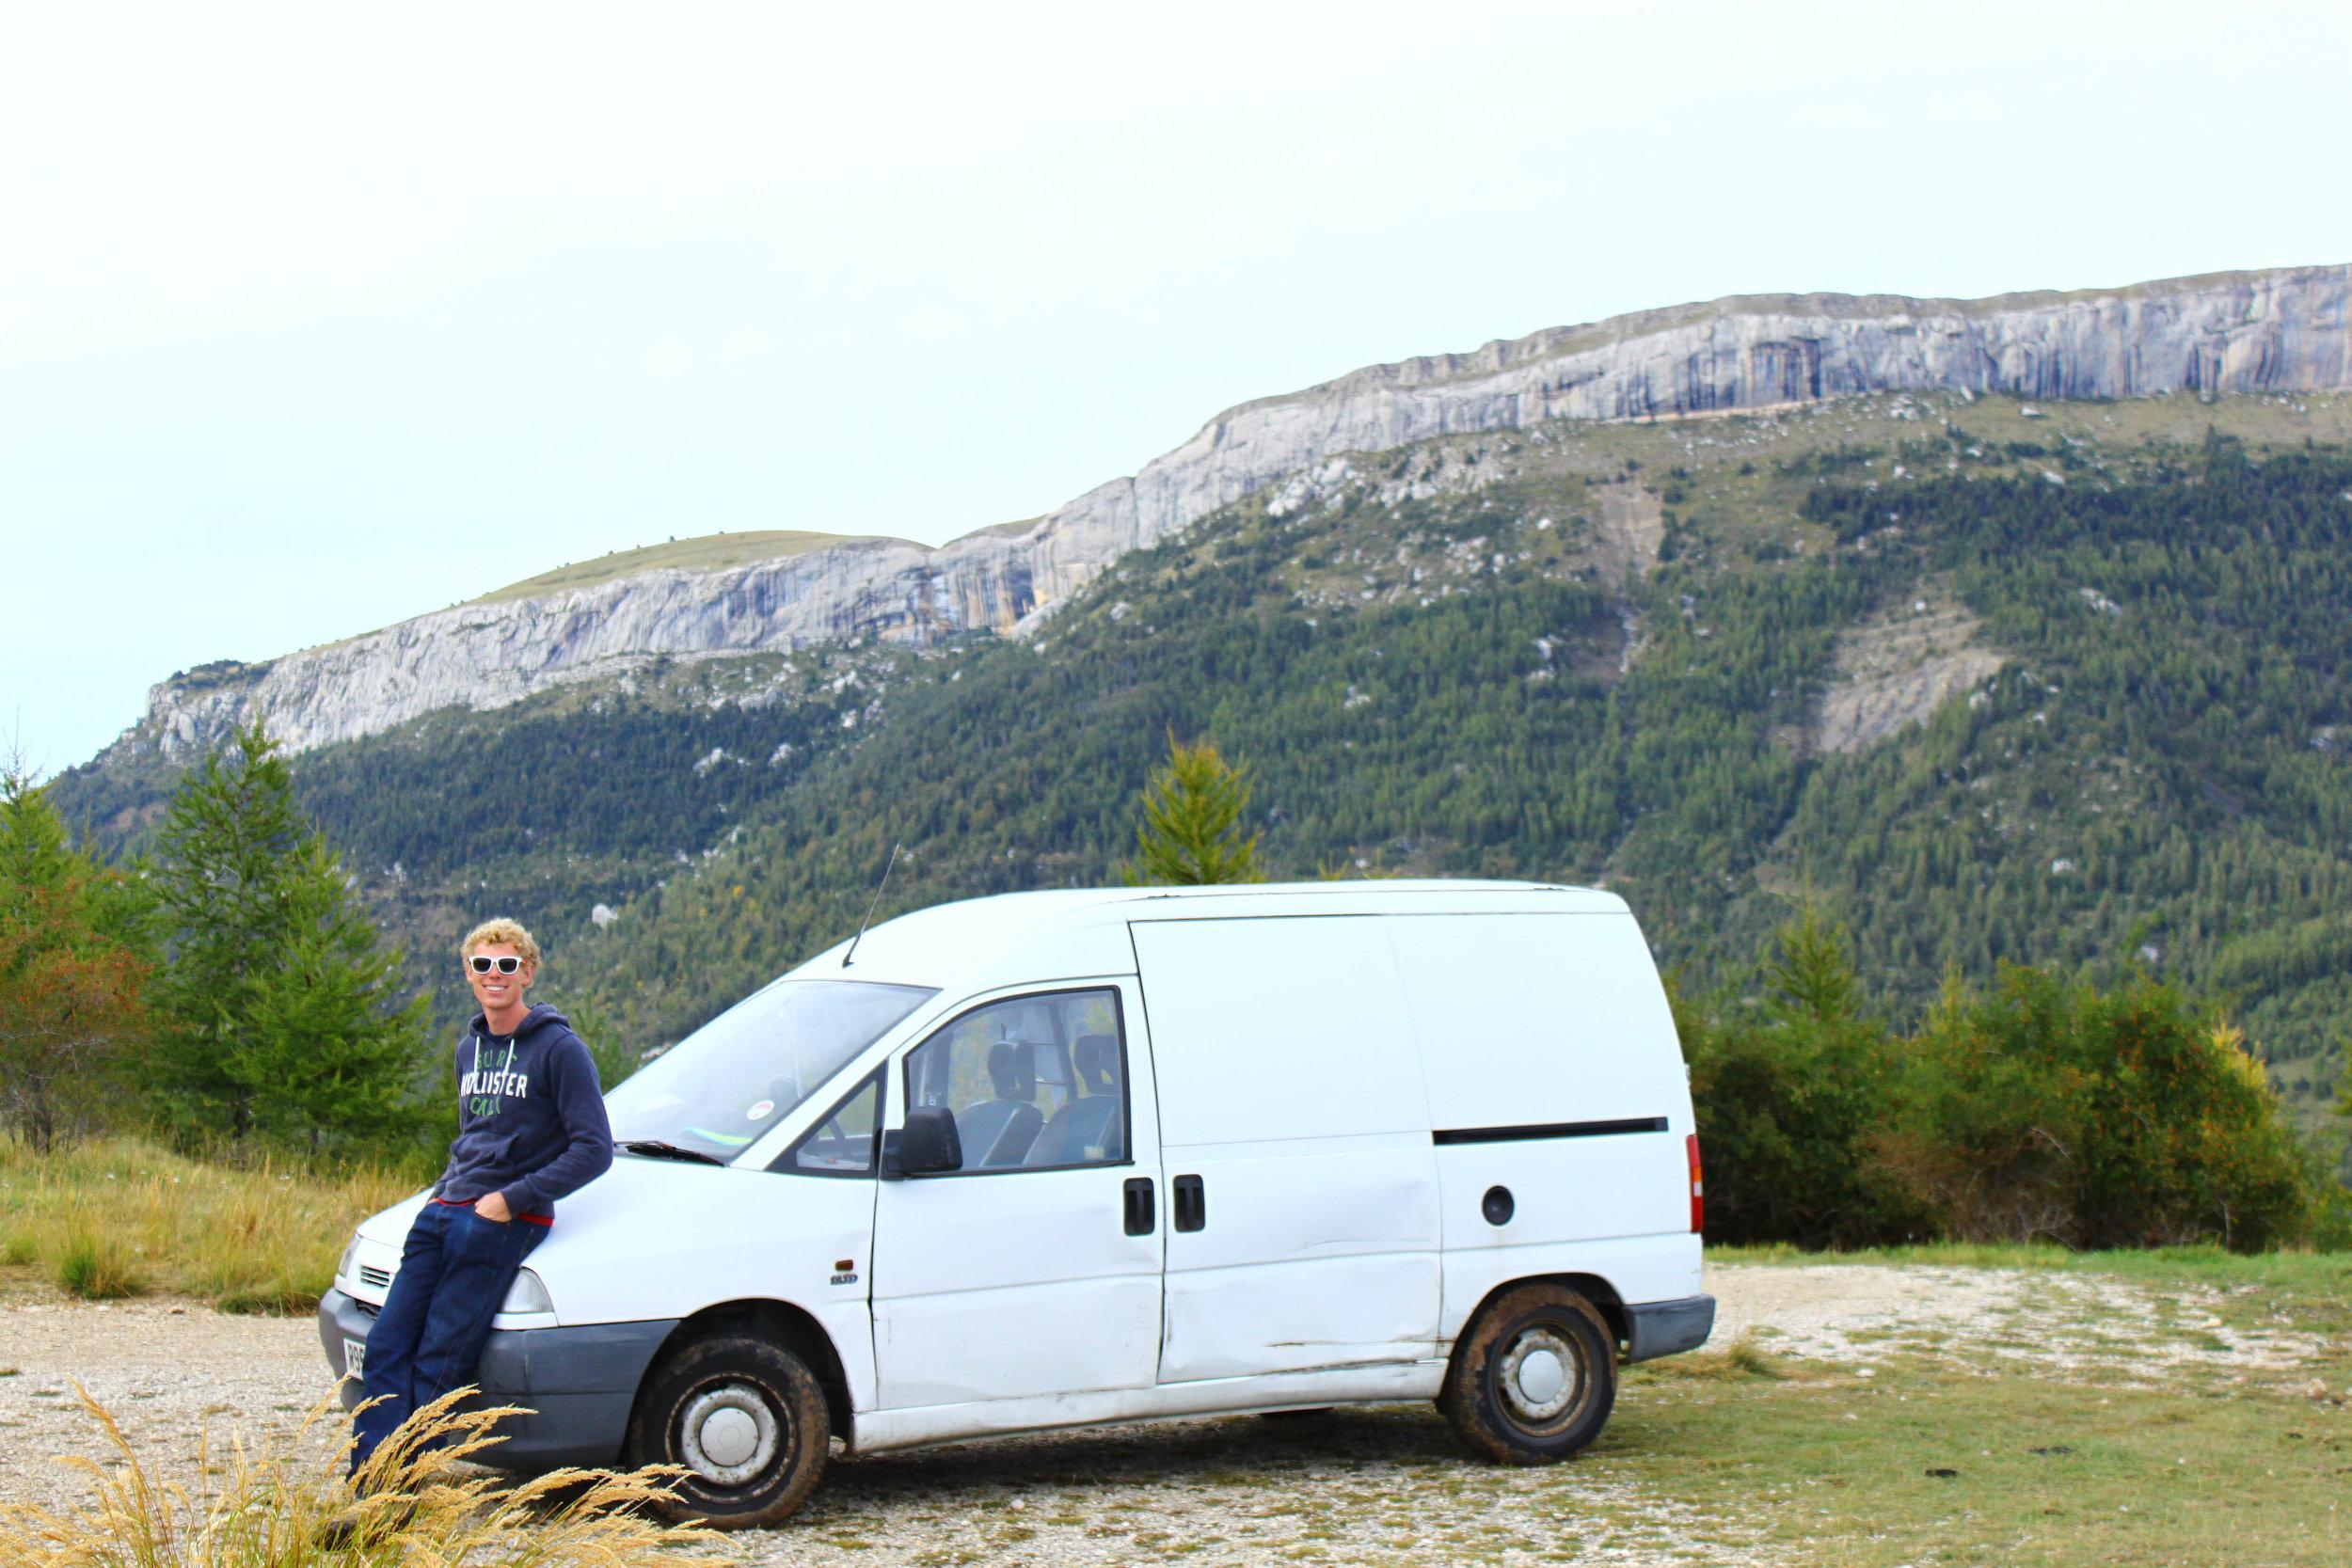 The van and Ceuse. Photo: Rachel Slater